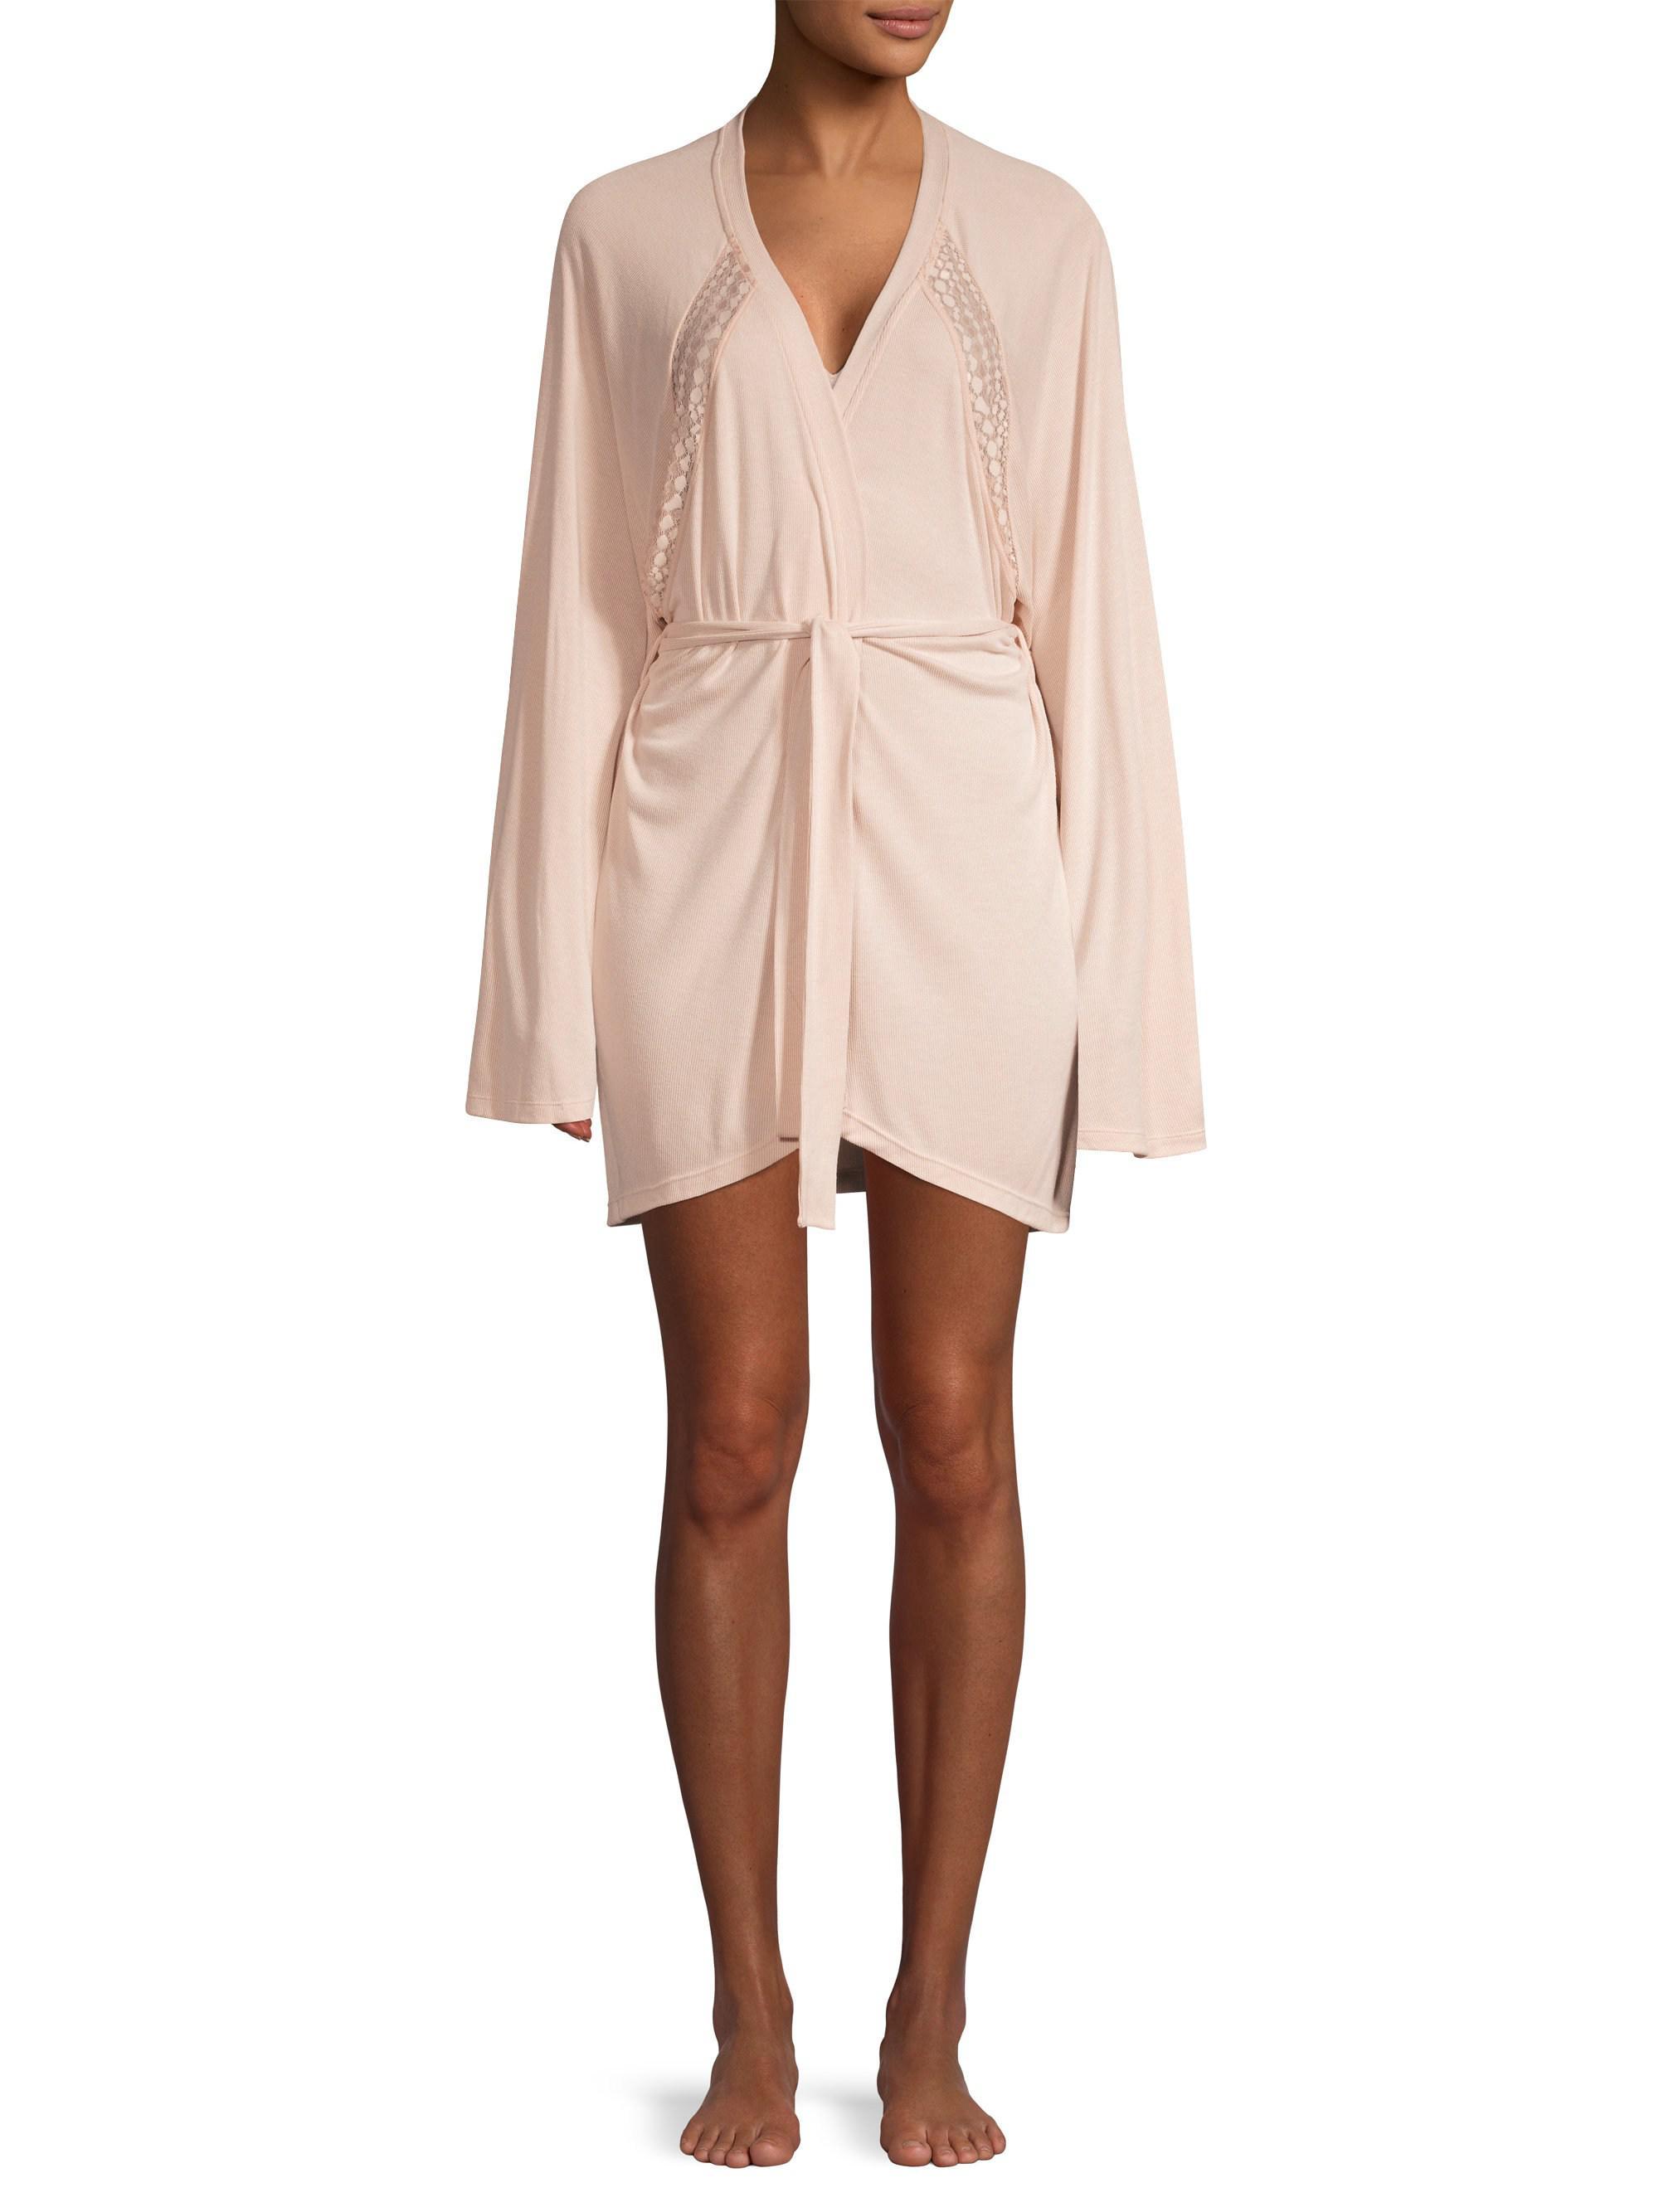 2a7c4595a45a Cosabella - Pink Sweet Dreams Lace-trim Robe - Lyst. View fullscreen